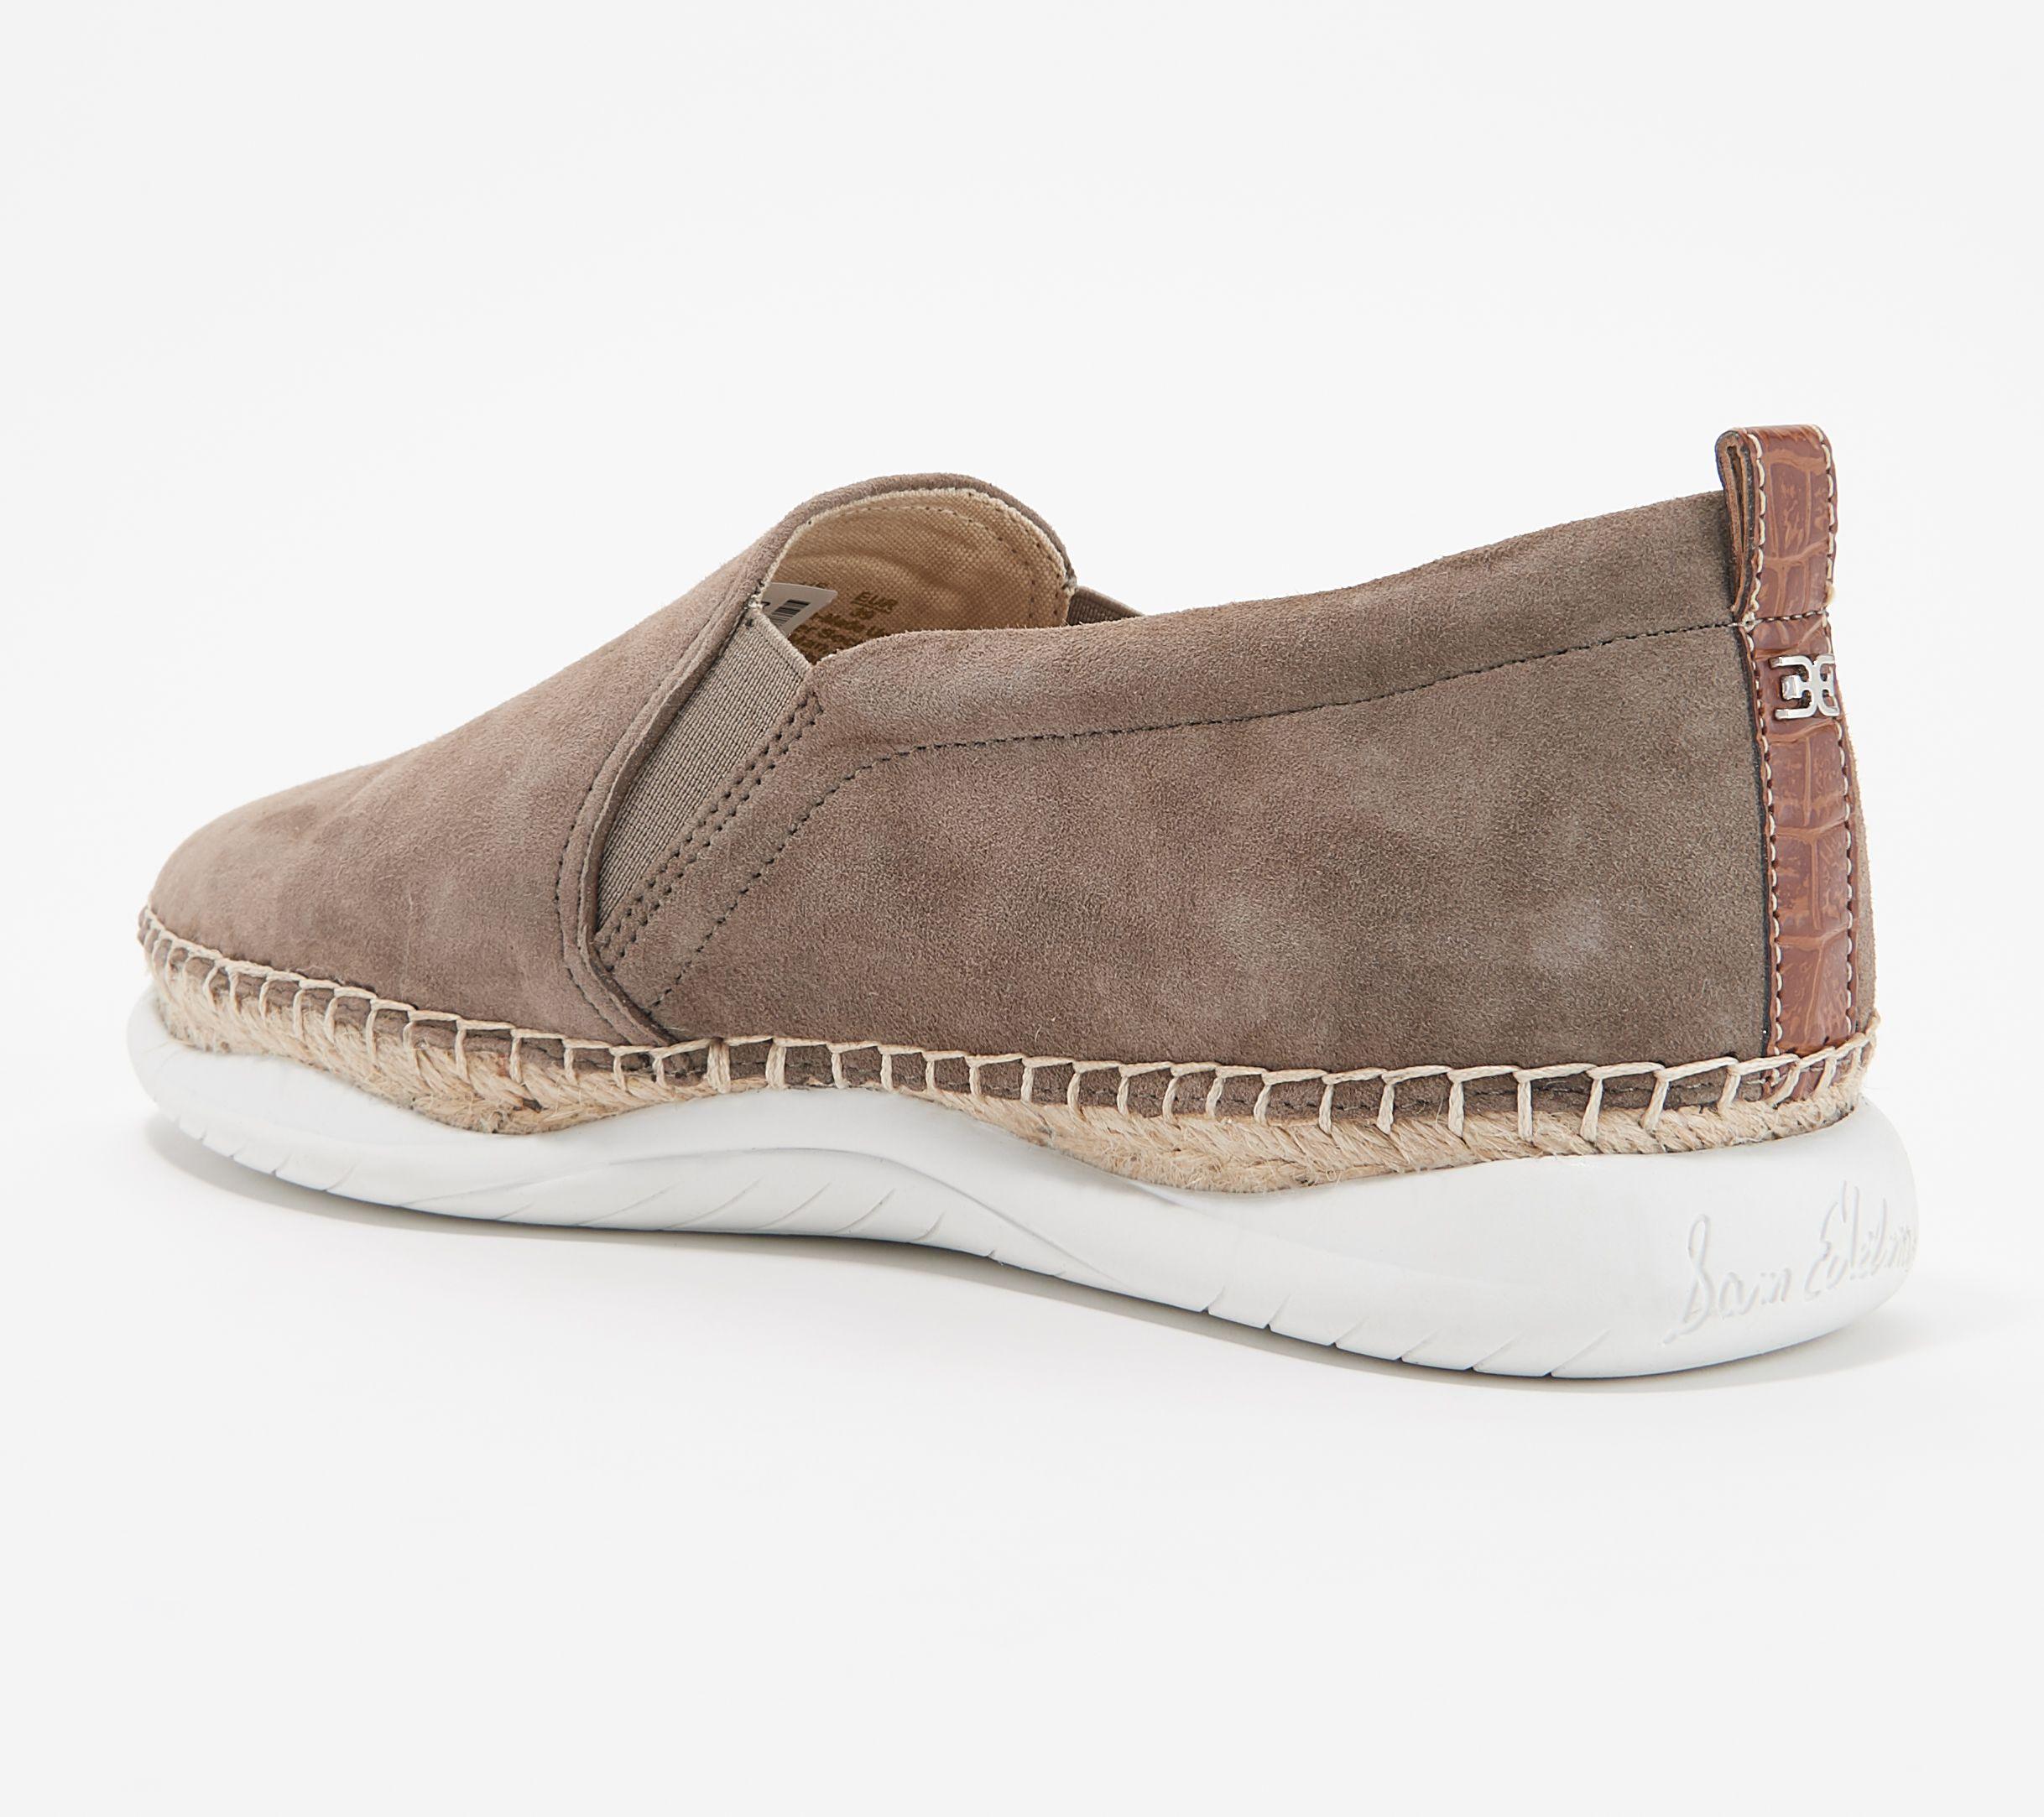 28b445c7d824 Sam Edelman Leather Slip-On Espadrille Sneakers - Kassie — QVC.com